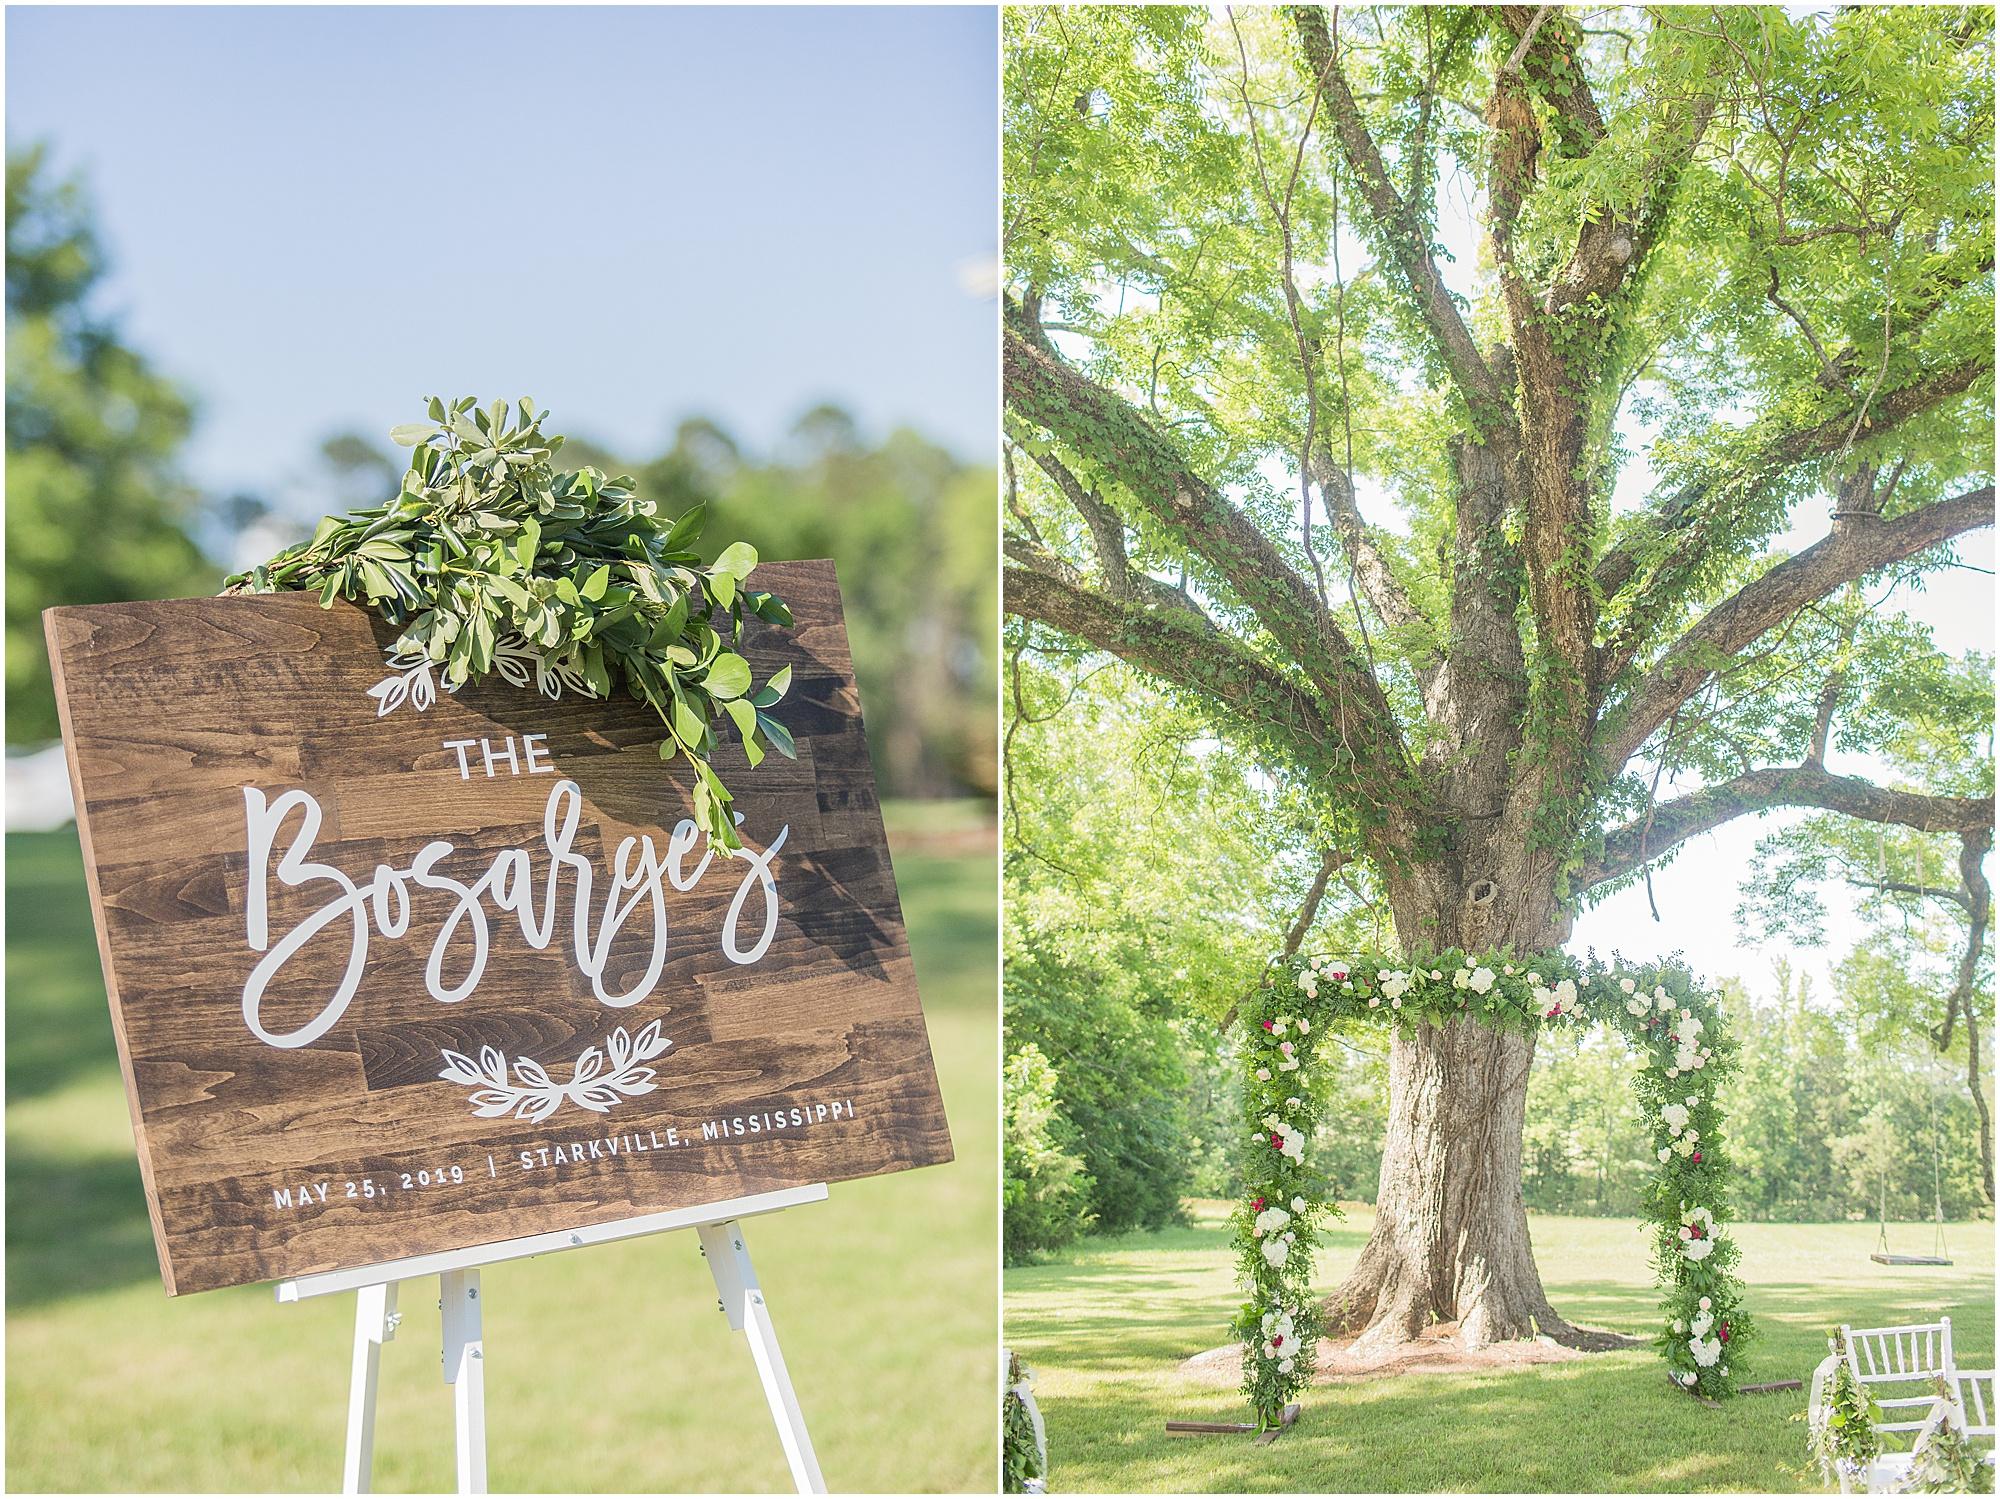 starkville-mississippi-wedding-page-place-dodson-farms_0051.jpg